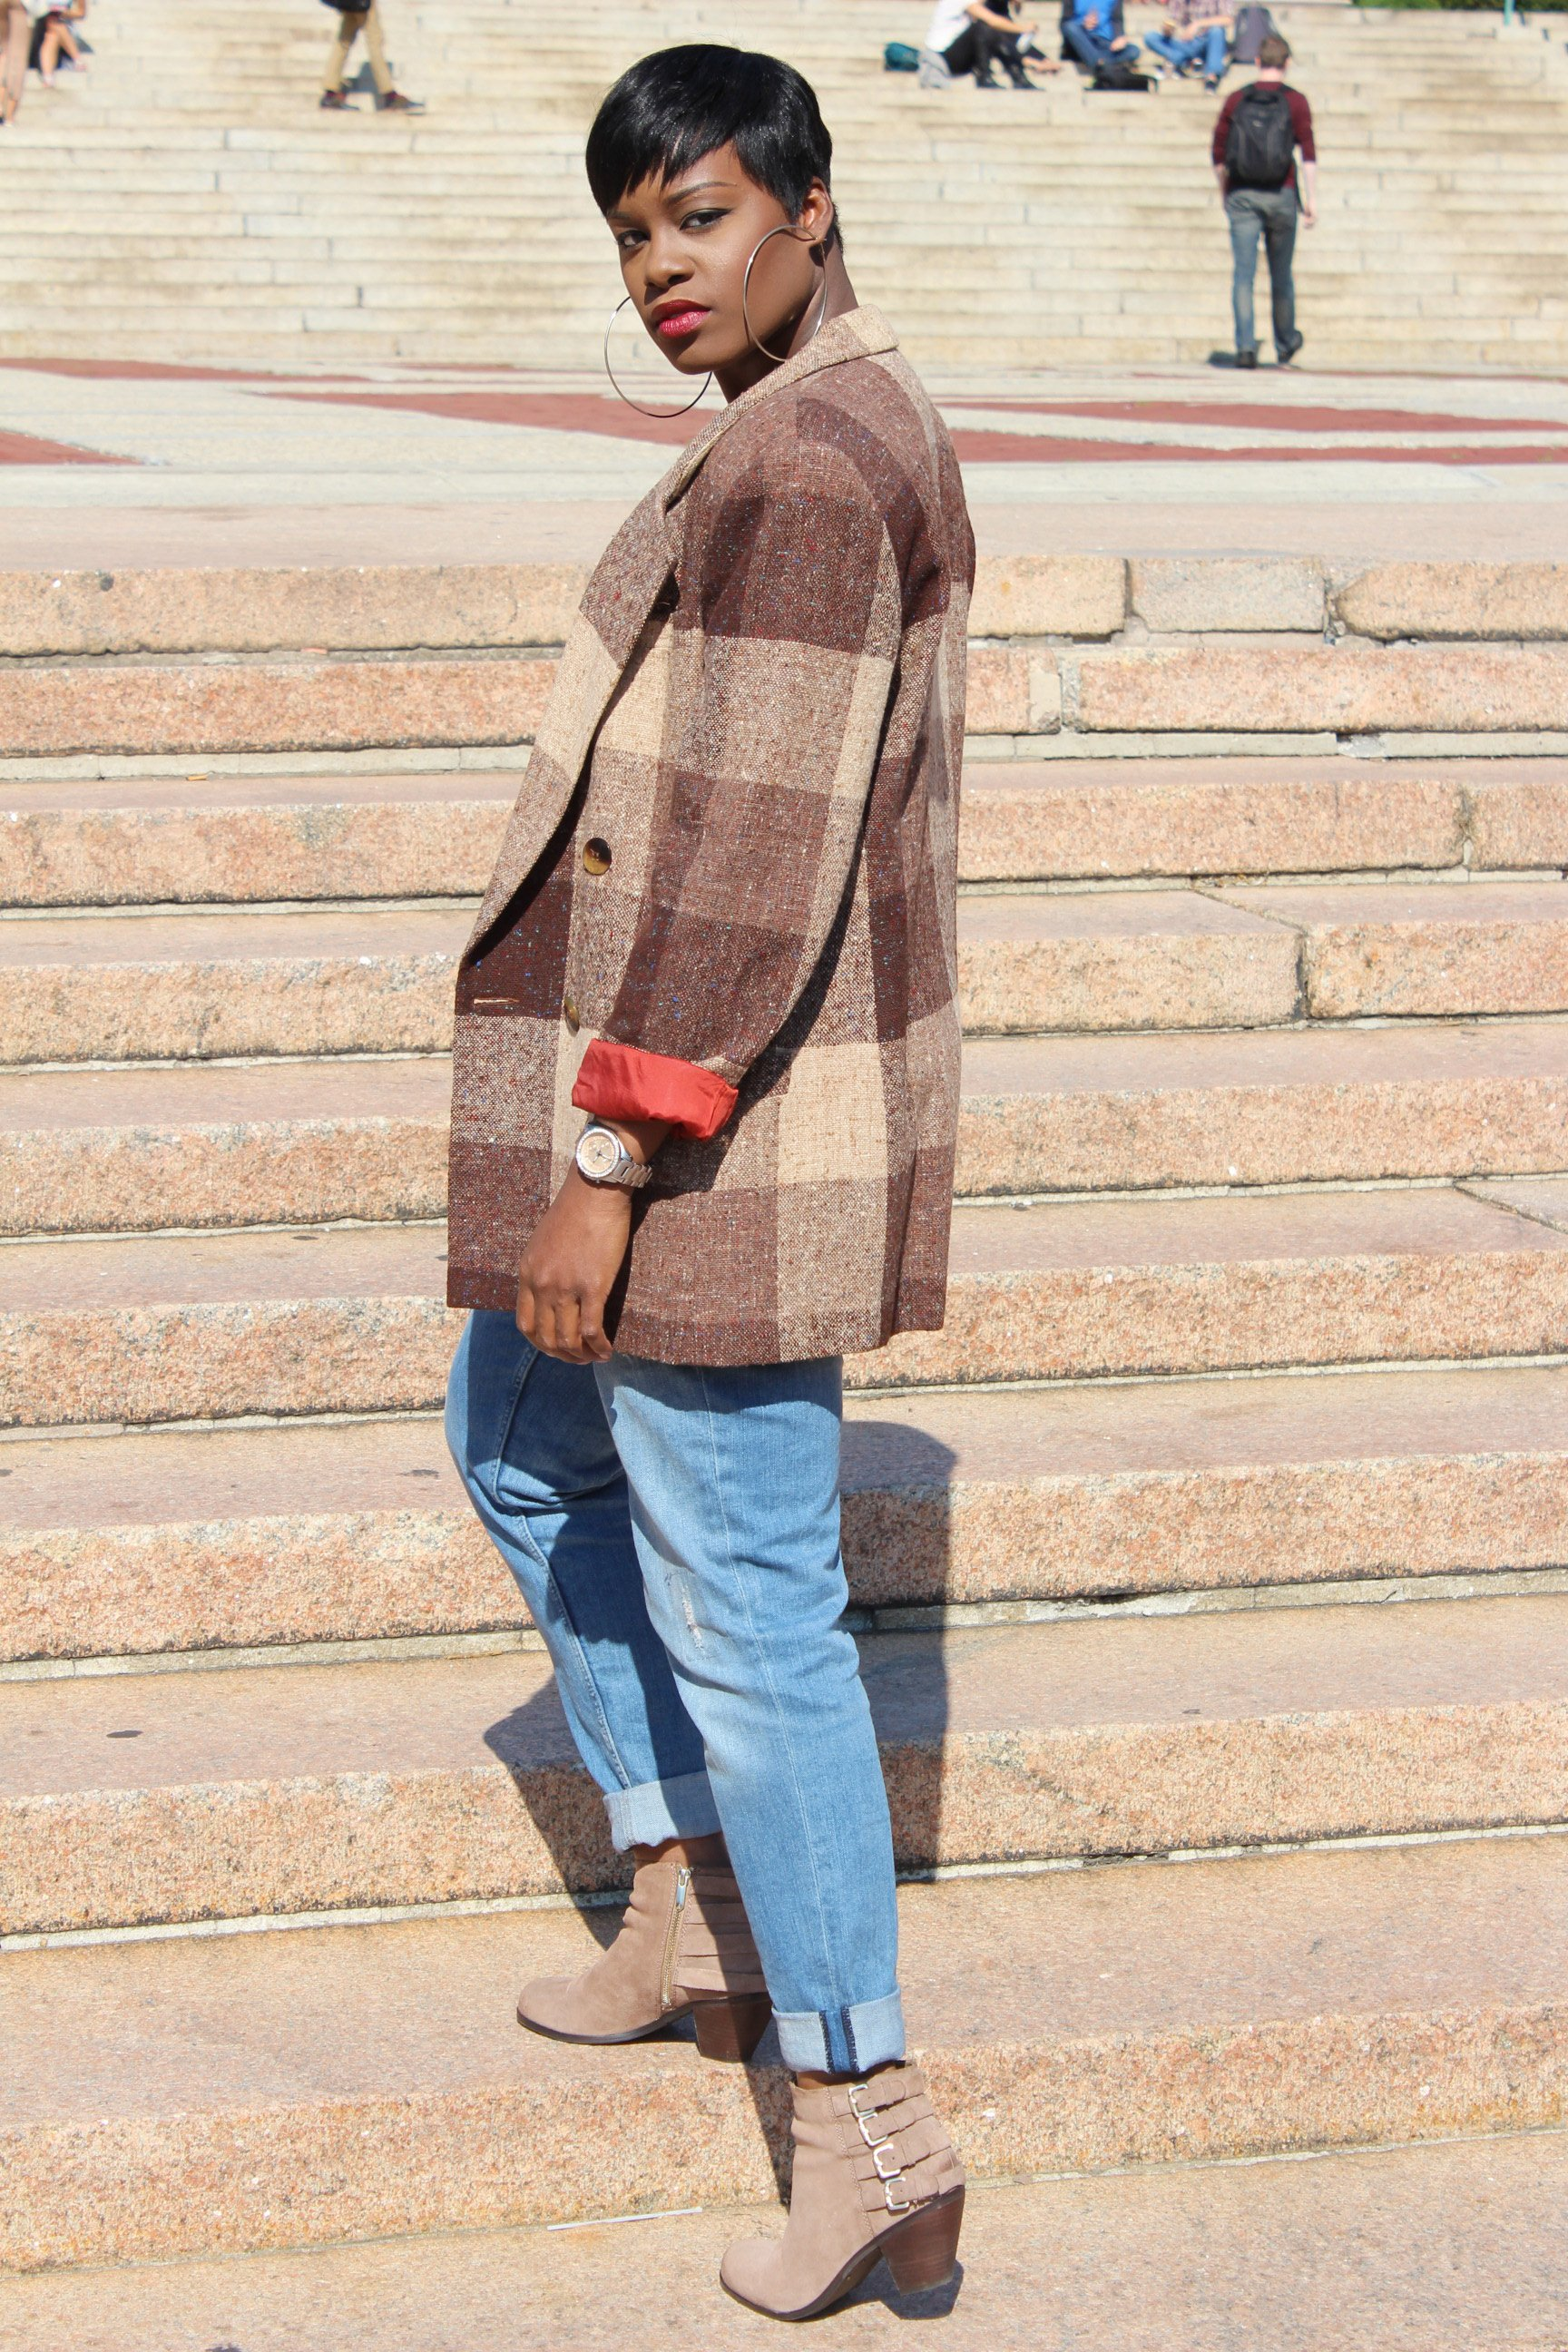 oleg-cassini-vintage-blazer-outfit-7